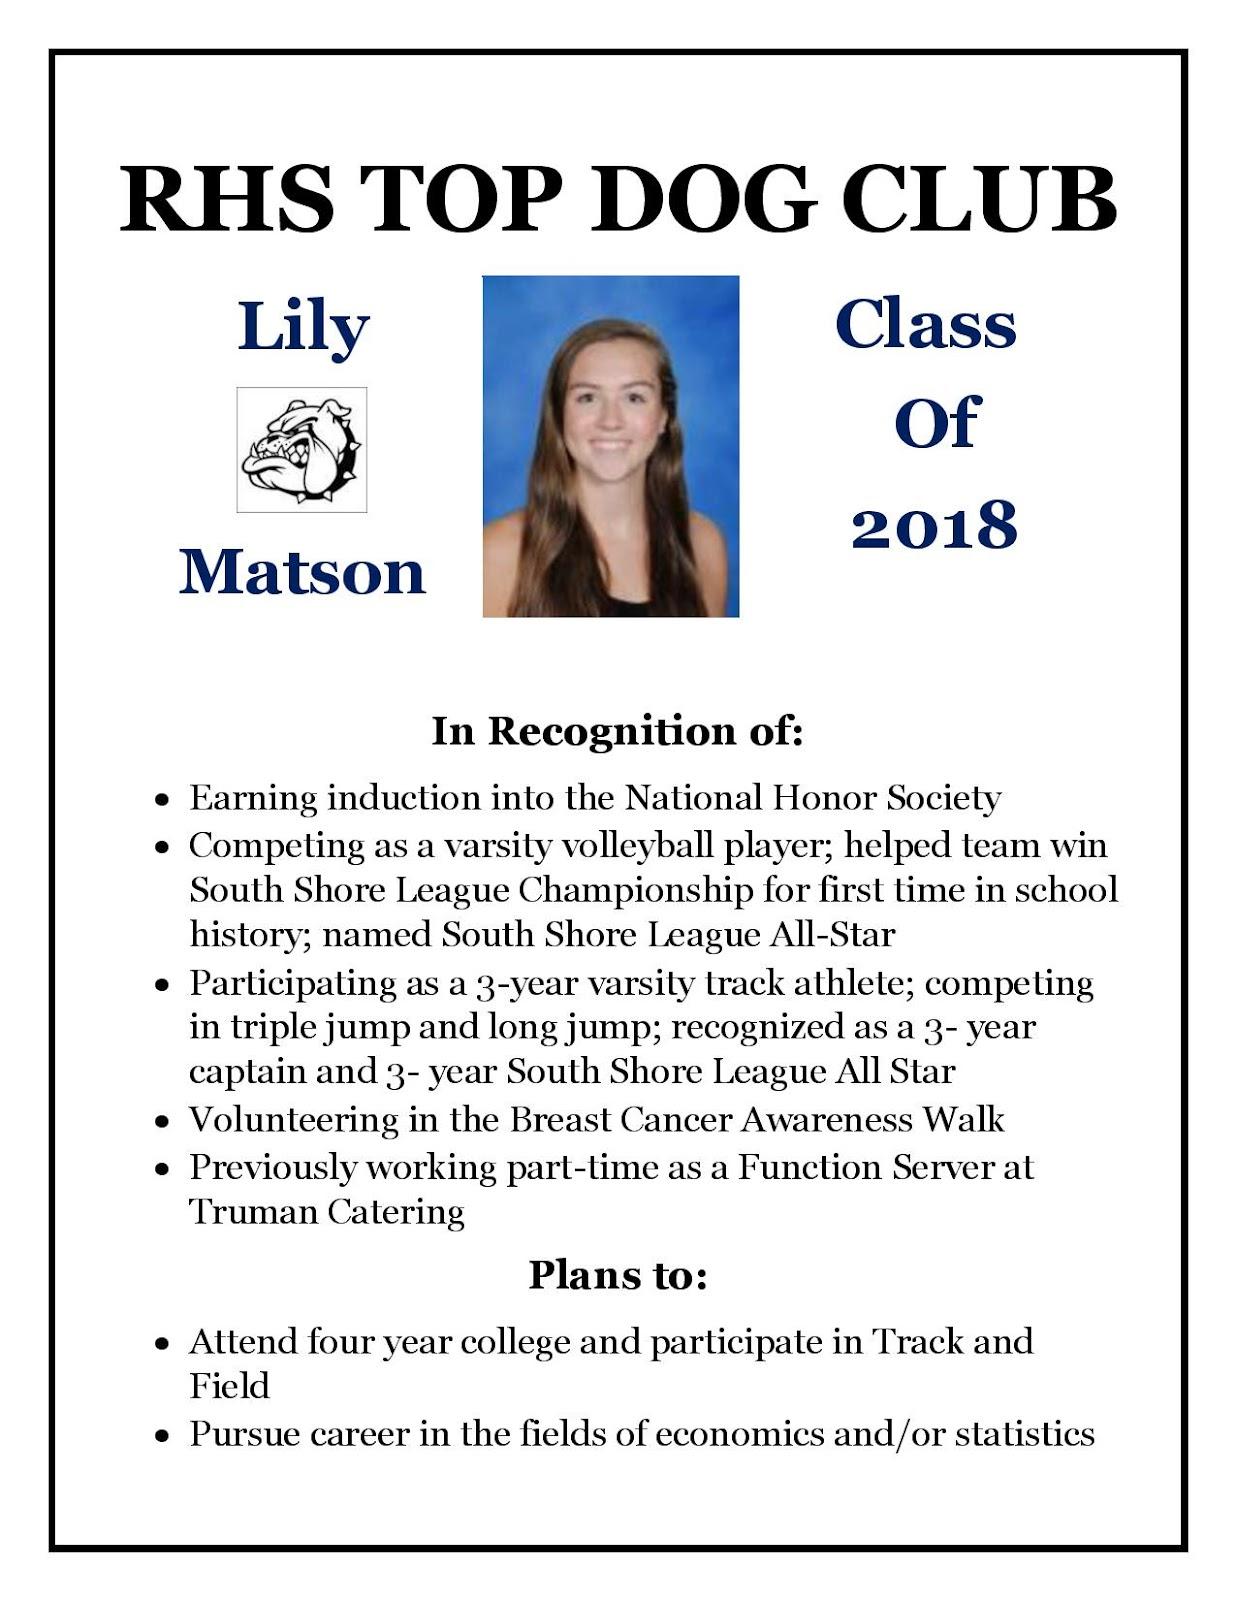 Topdogclub_L.Matson-page-001.jpg